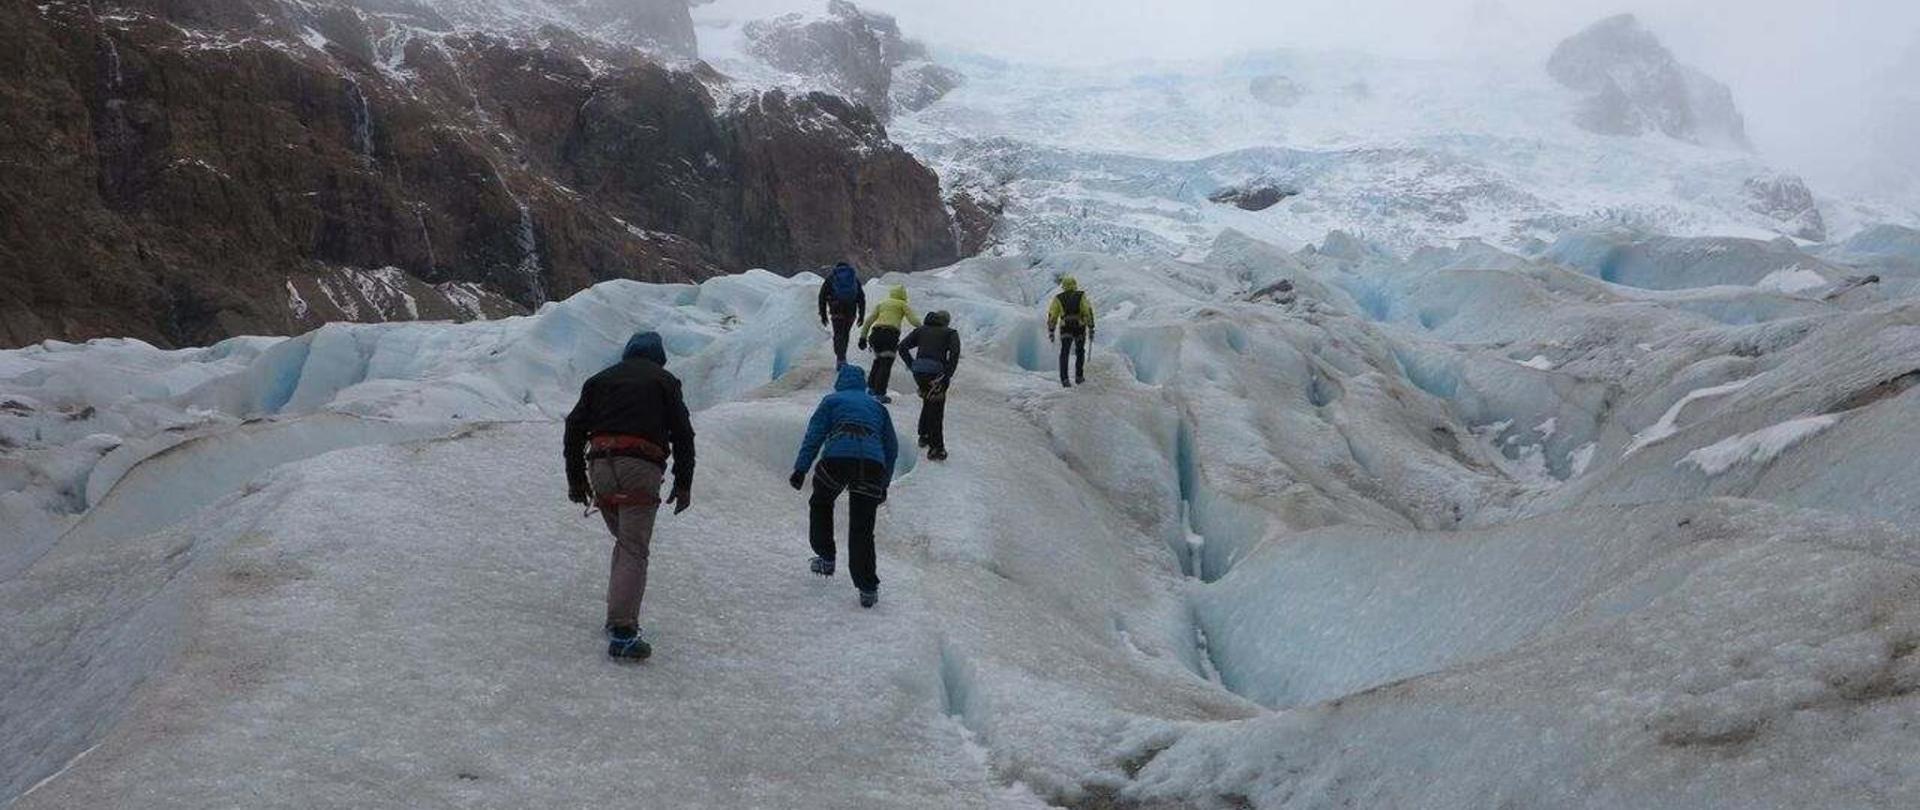 glaciar-cagliero-6-1.jpg